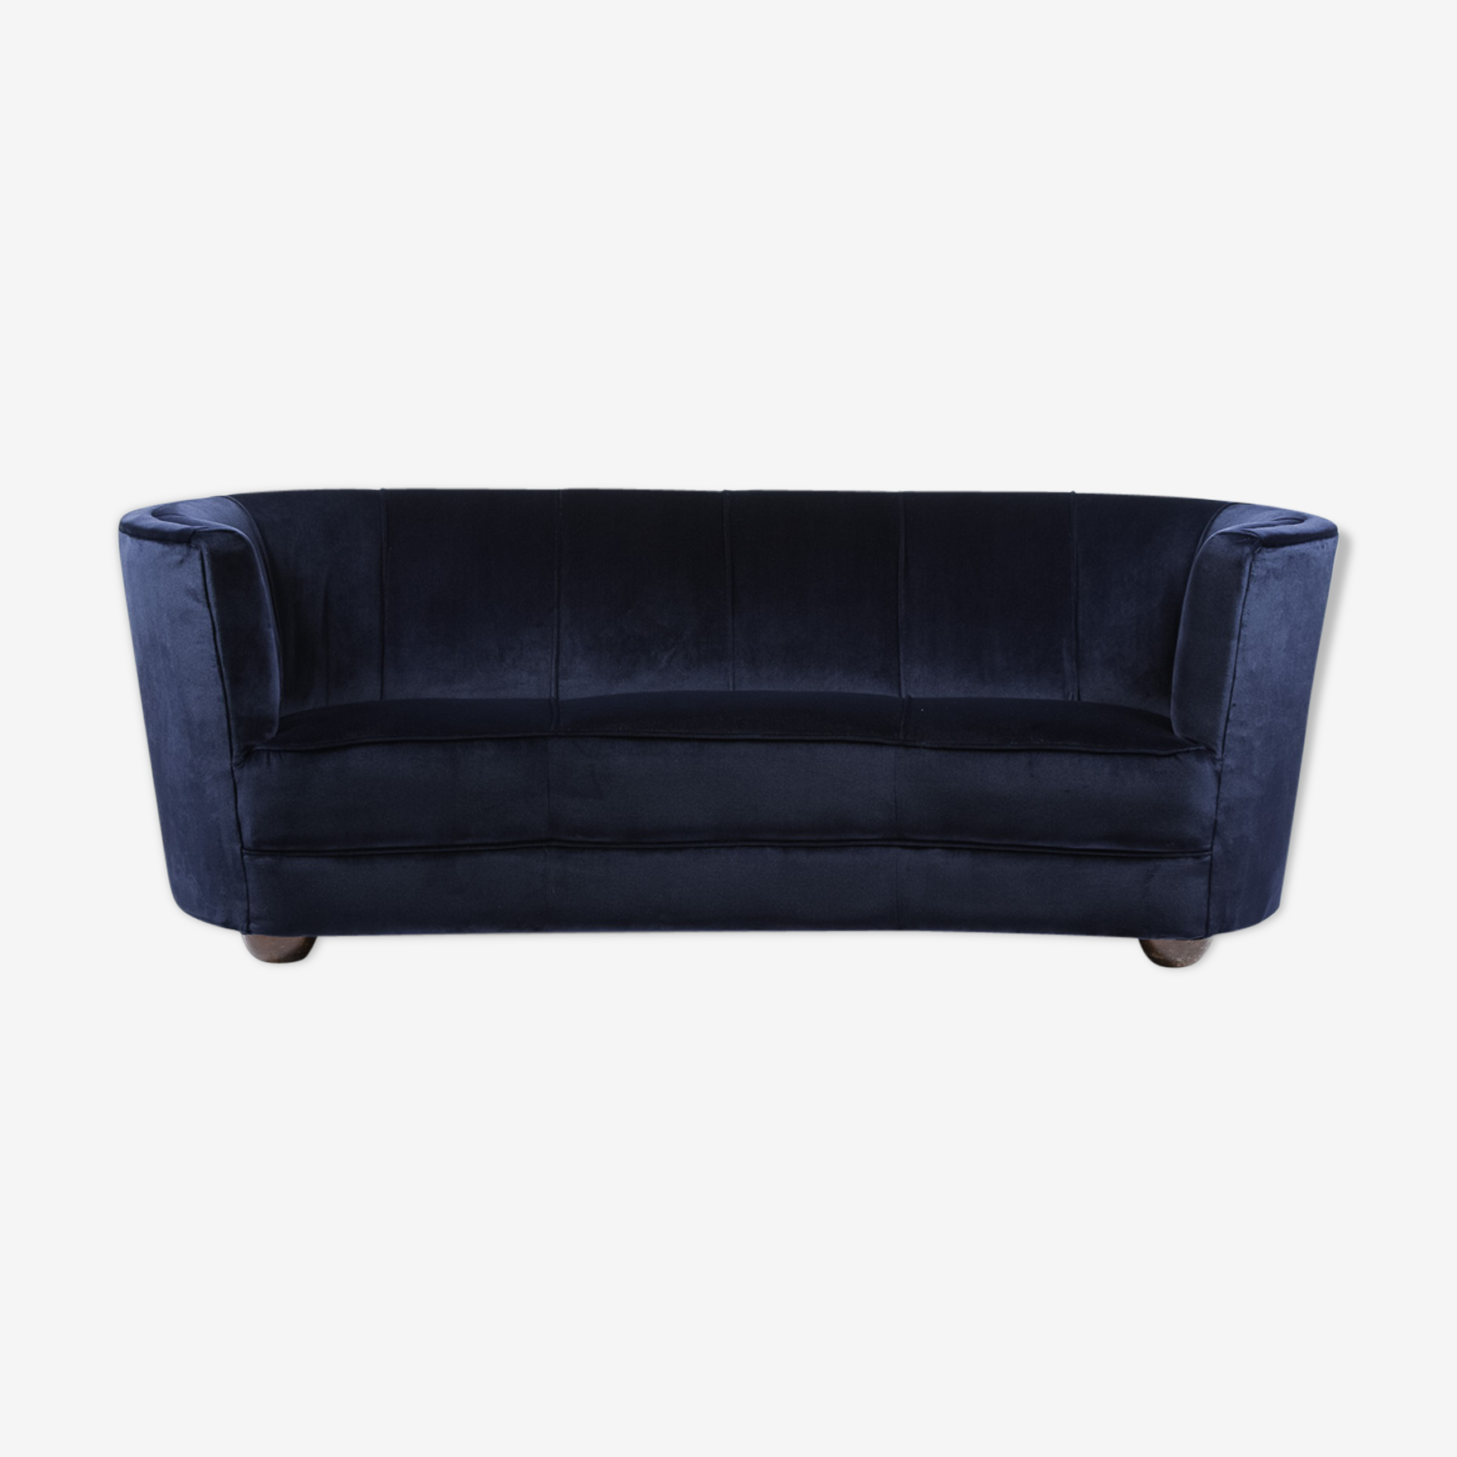 1940s Danish 'Banana' Sofa